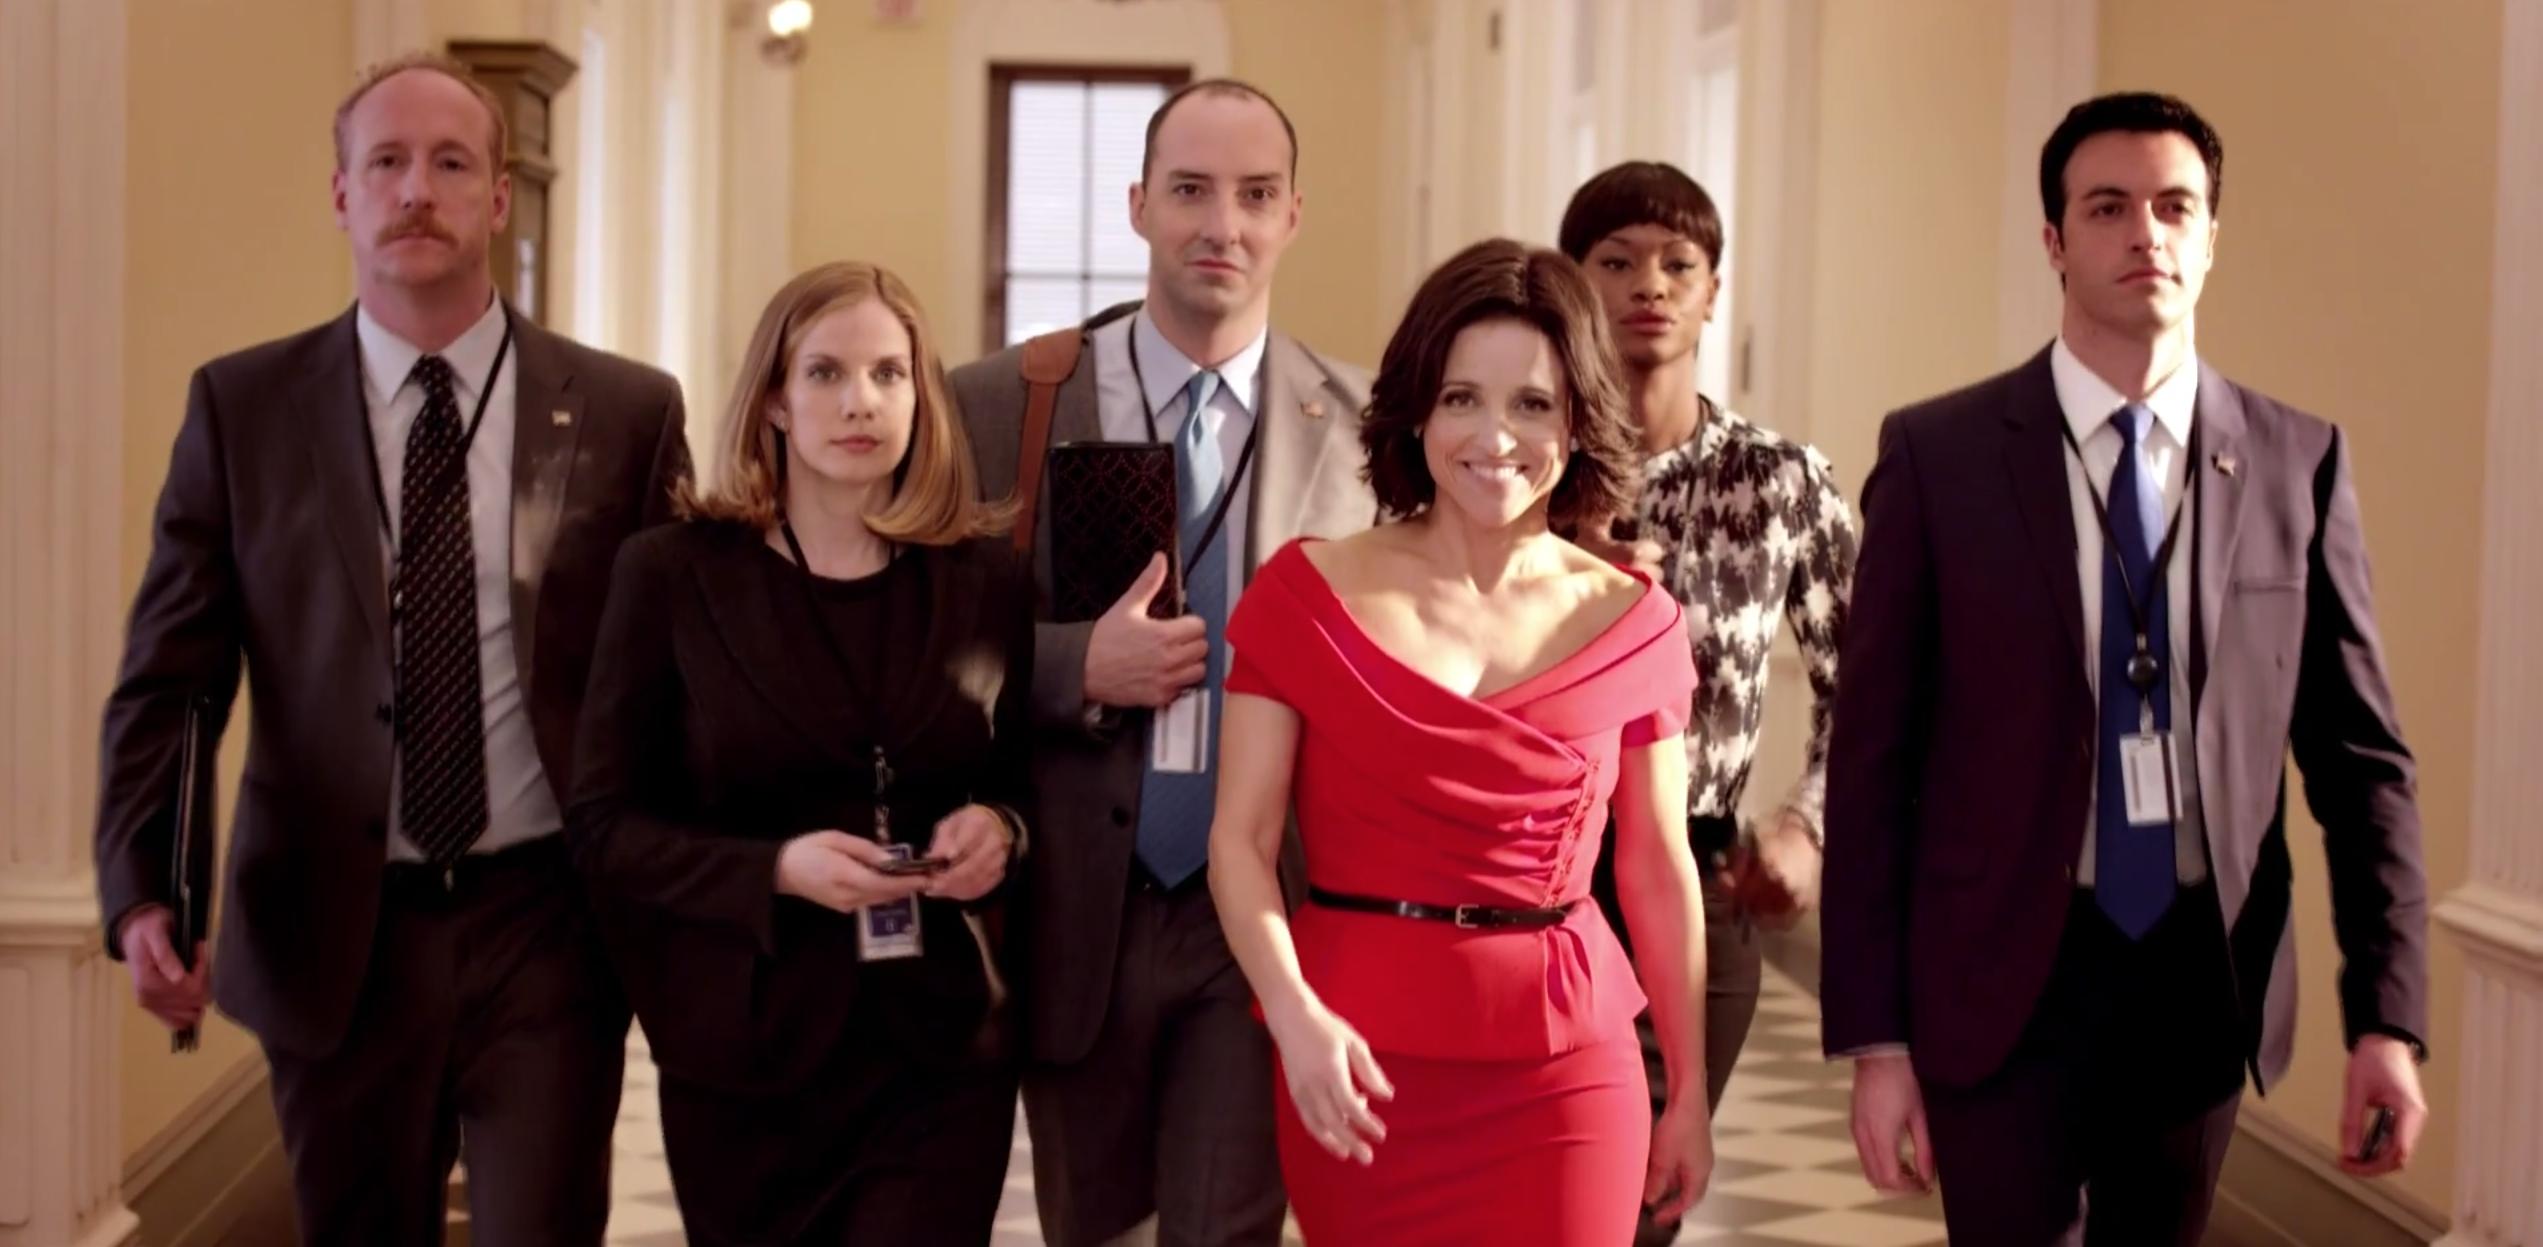 Screenshot of the main cast of Veep